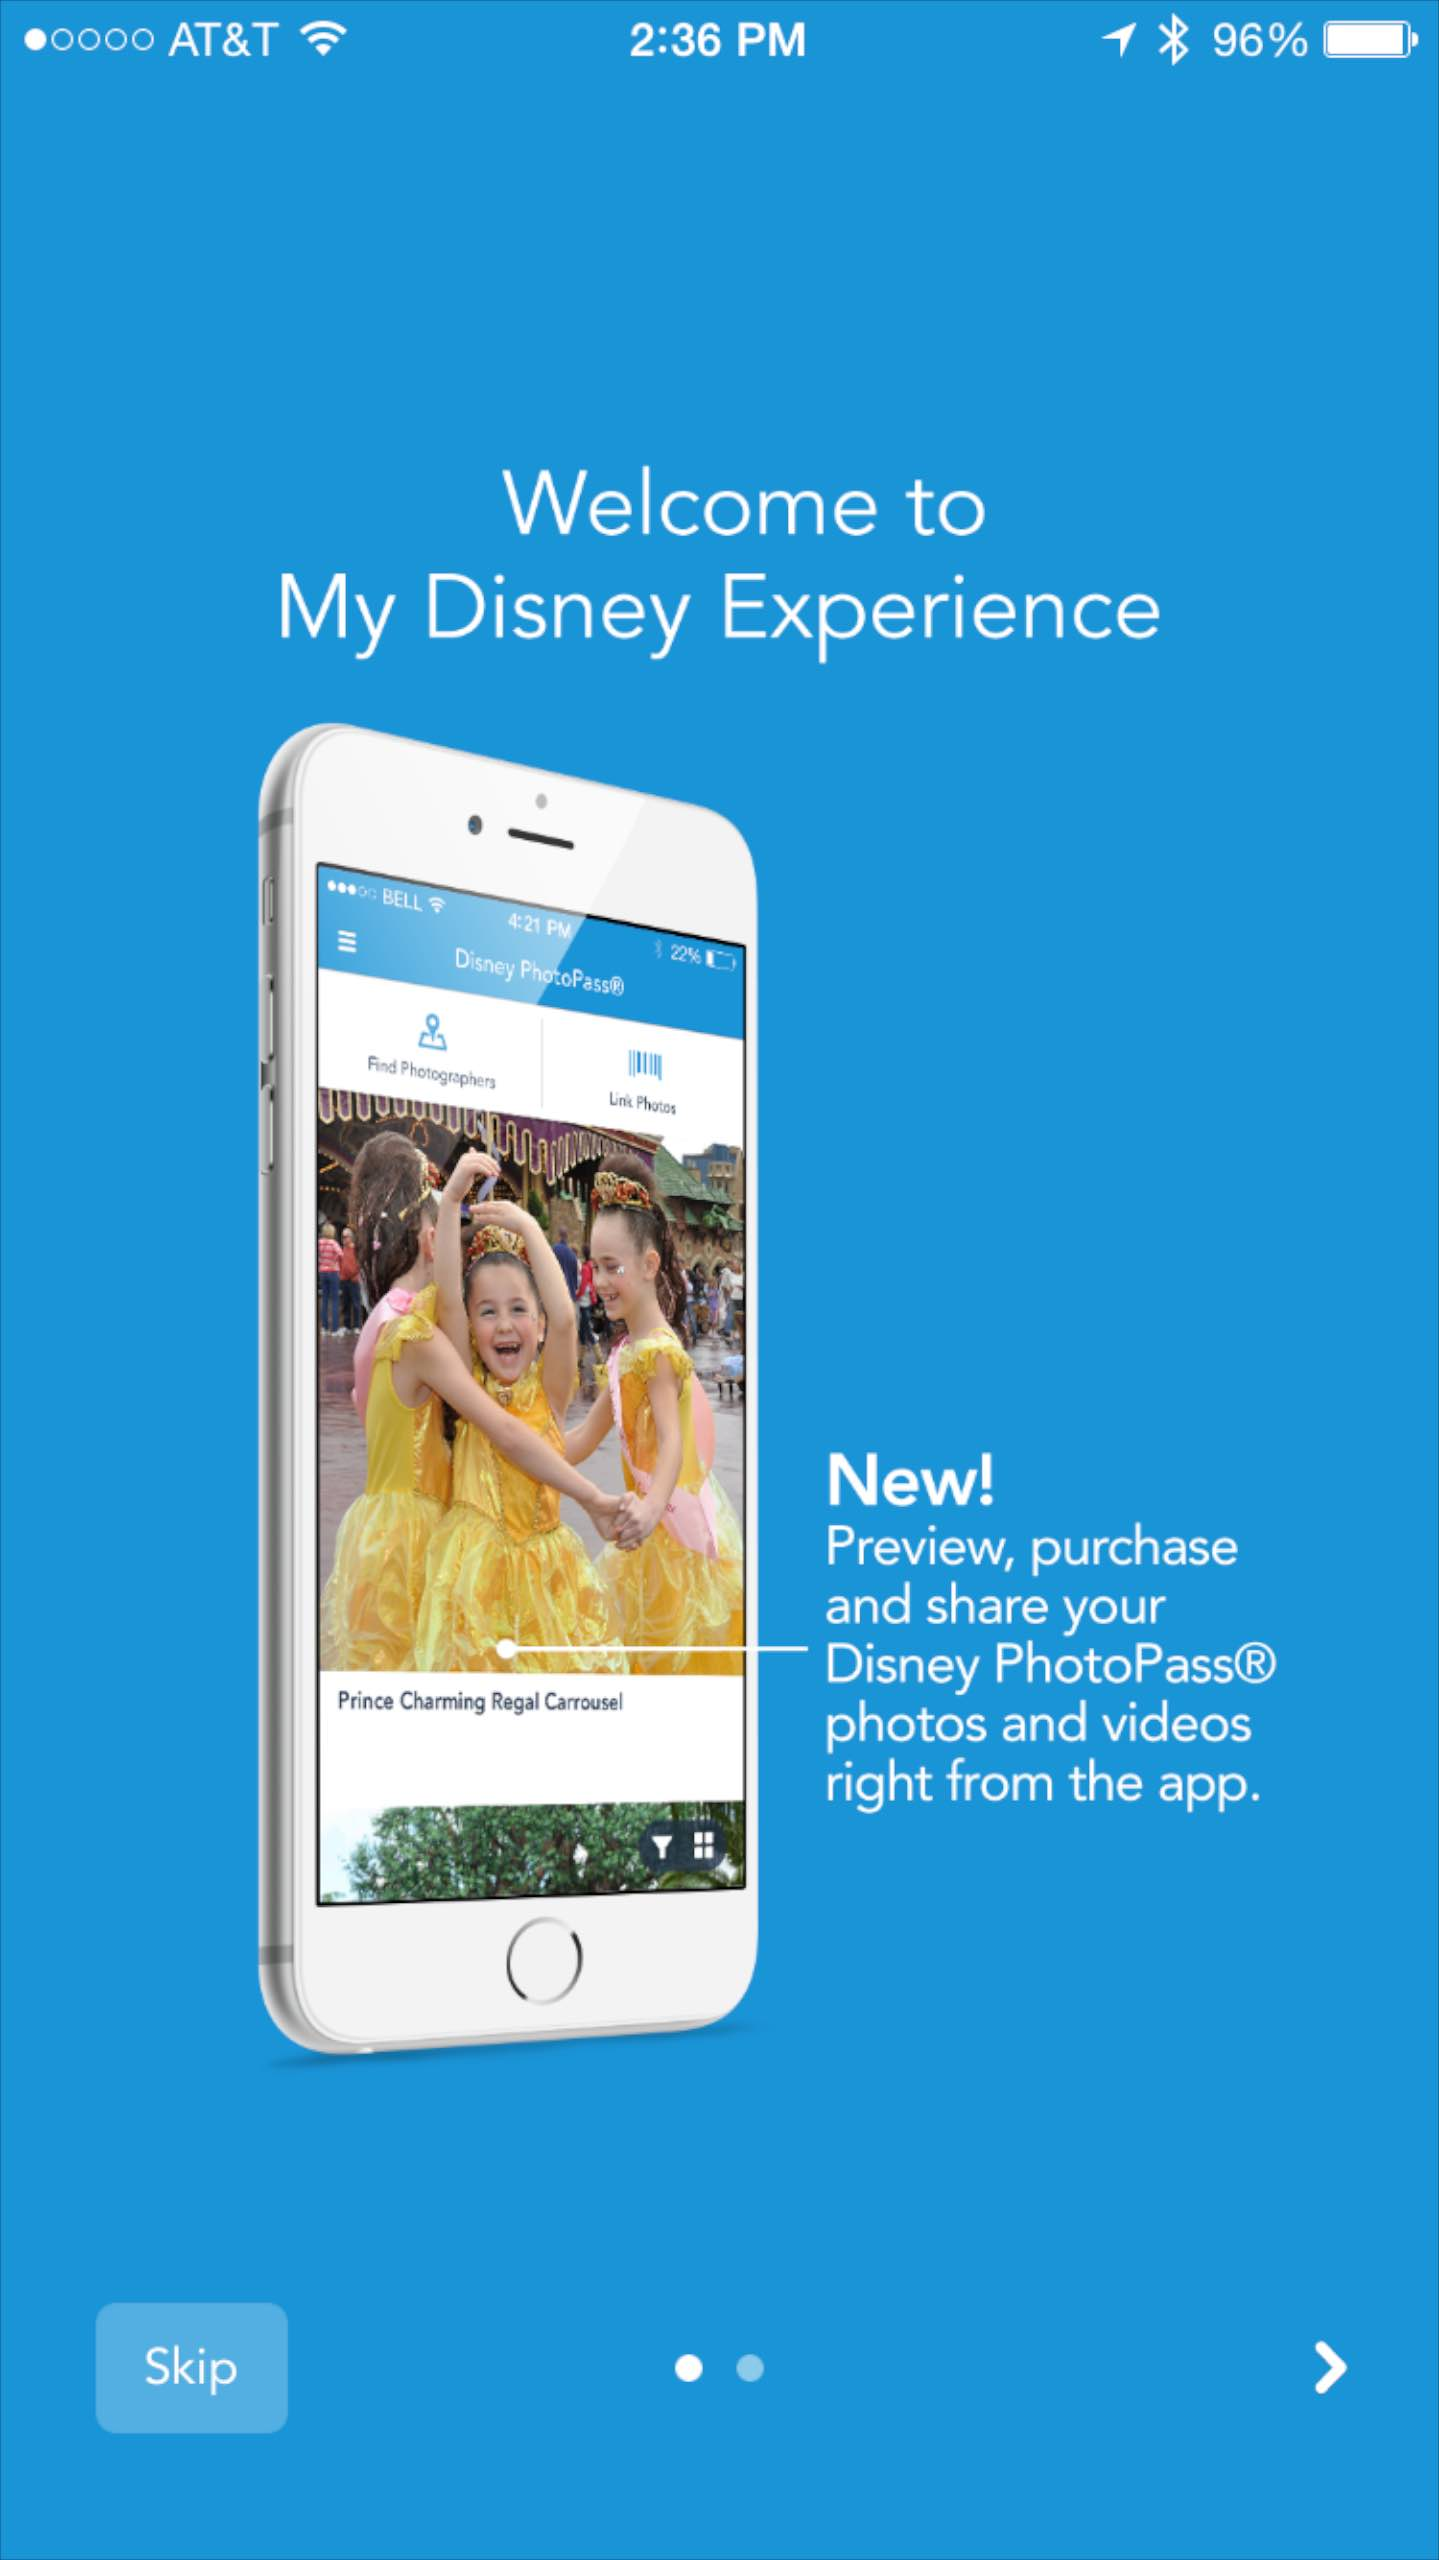 My Disney Experience PhotoPass screenshots